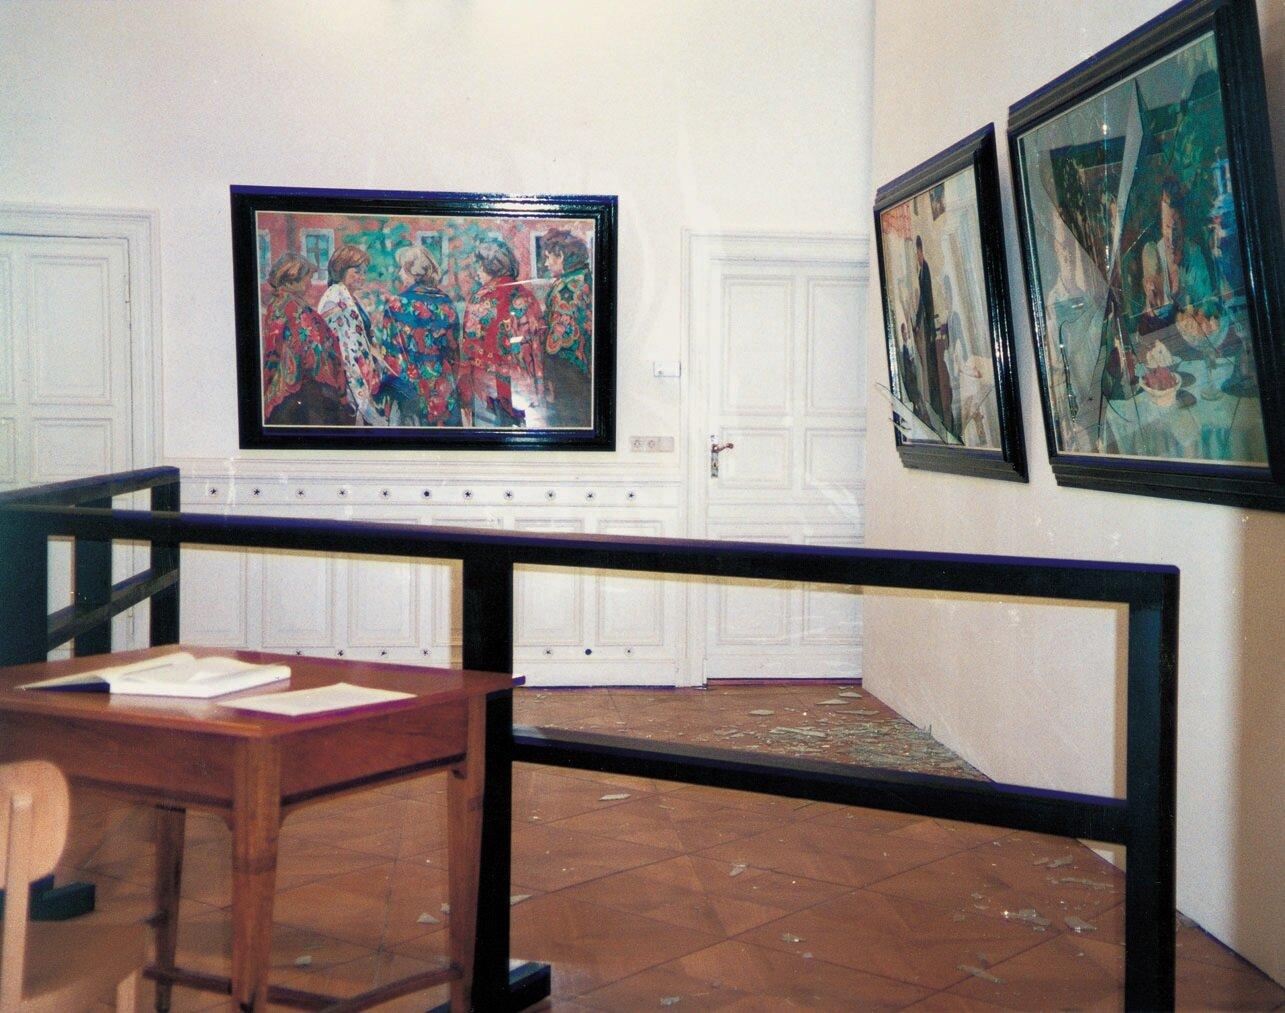 View-of-installation-Galerie-Barbara-Weiss-Berlin-1994-Photo-by-Jens-Ziehe.jpg